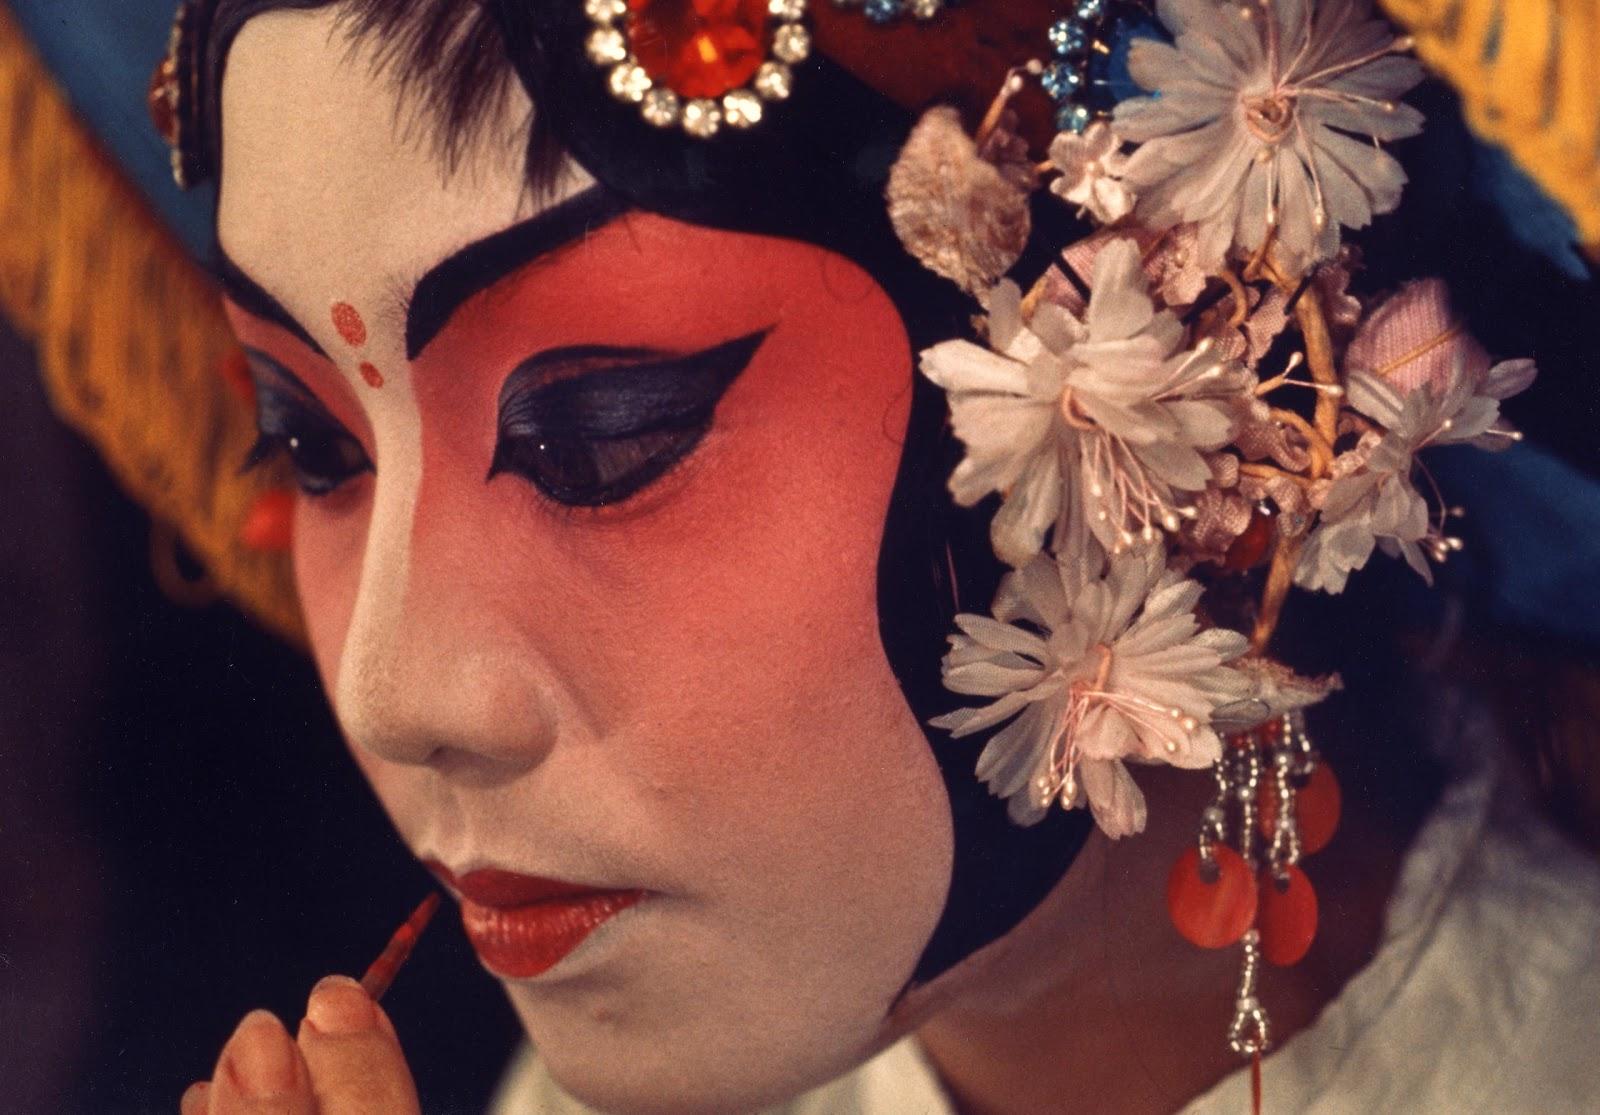 Why do women wear makeup: Why do women wear makeup - Theatre Makeup